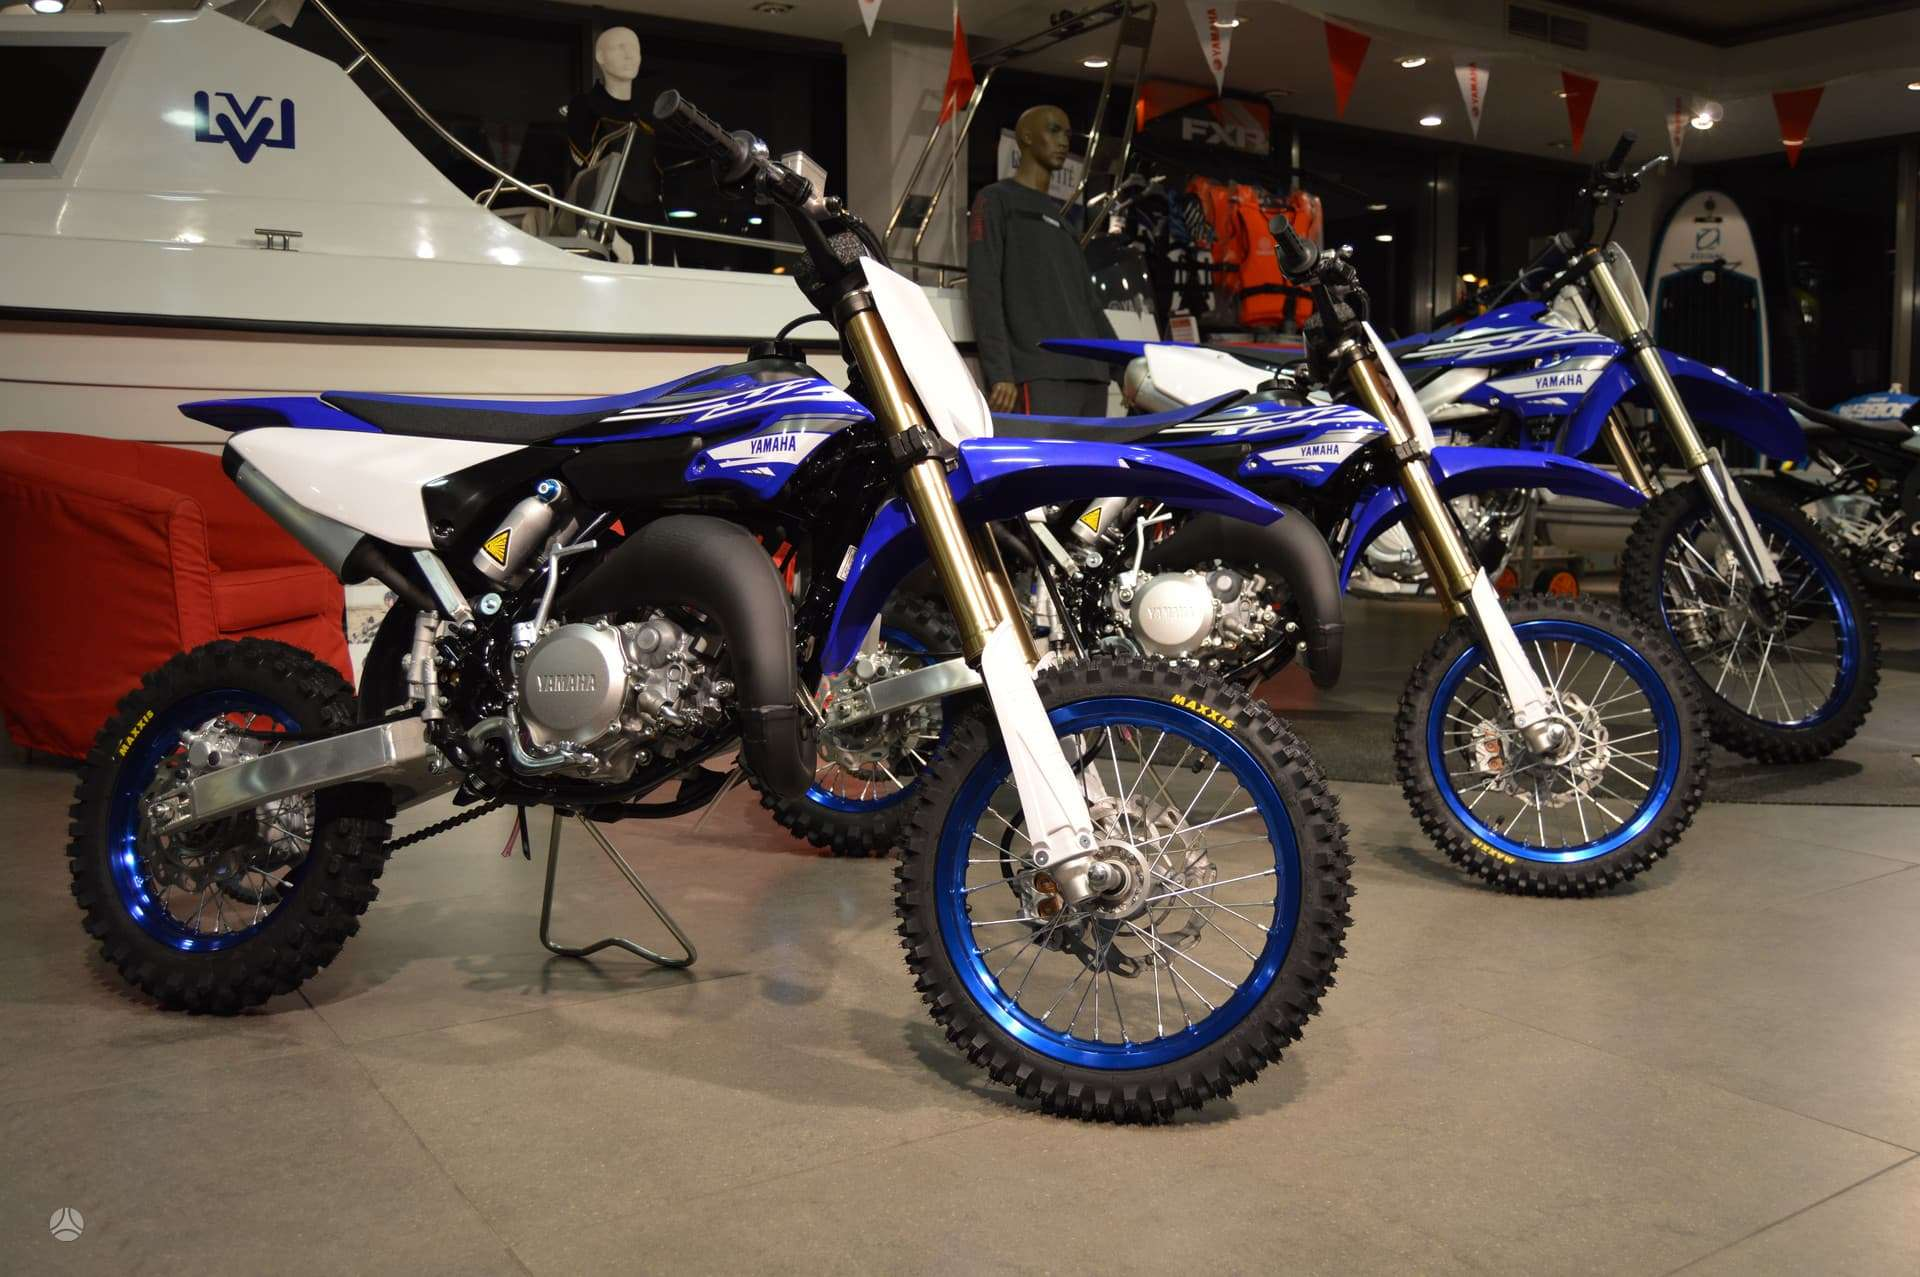 Yamaha Yz 65cc, krosiniai